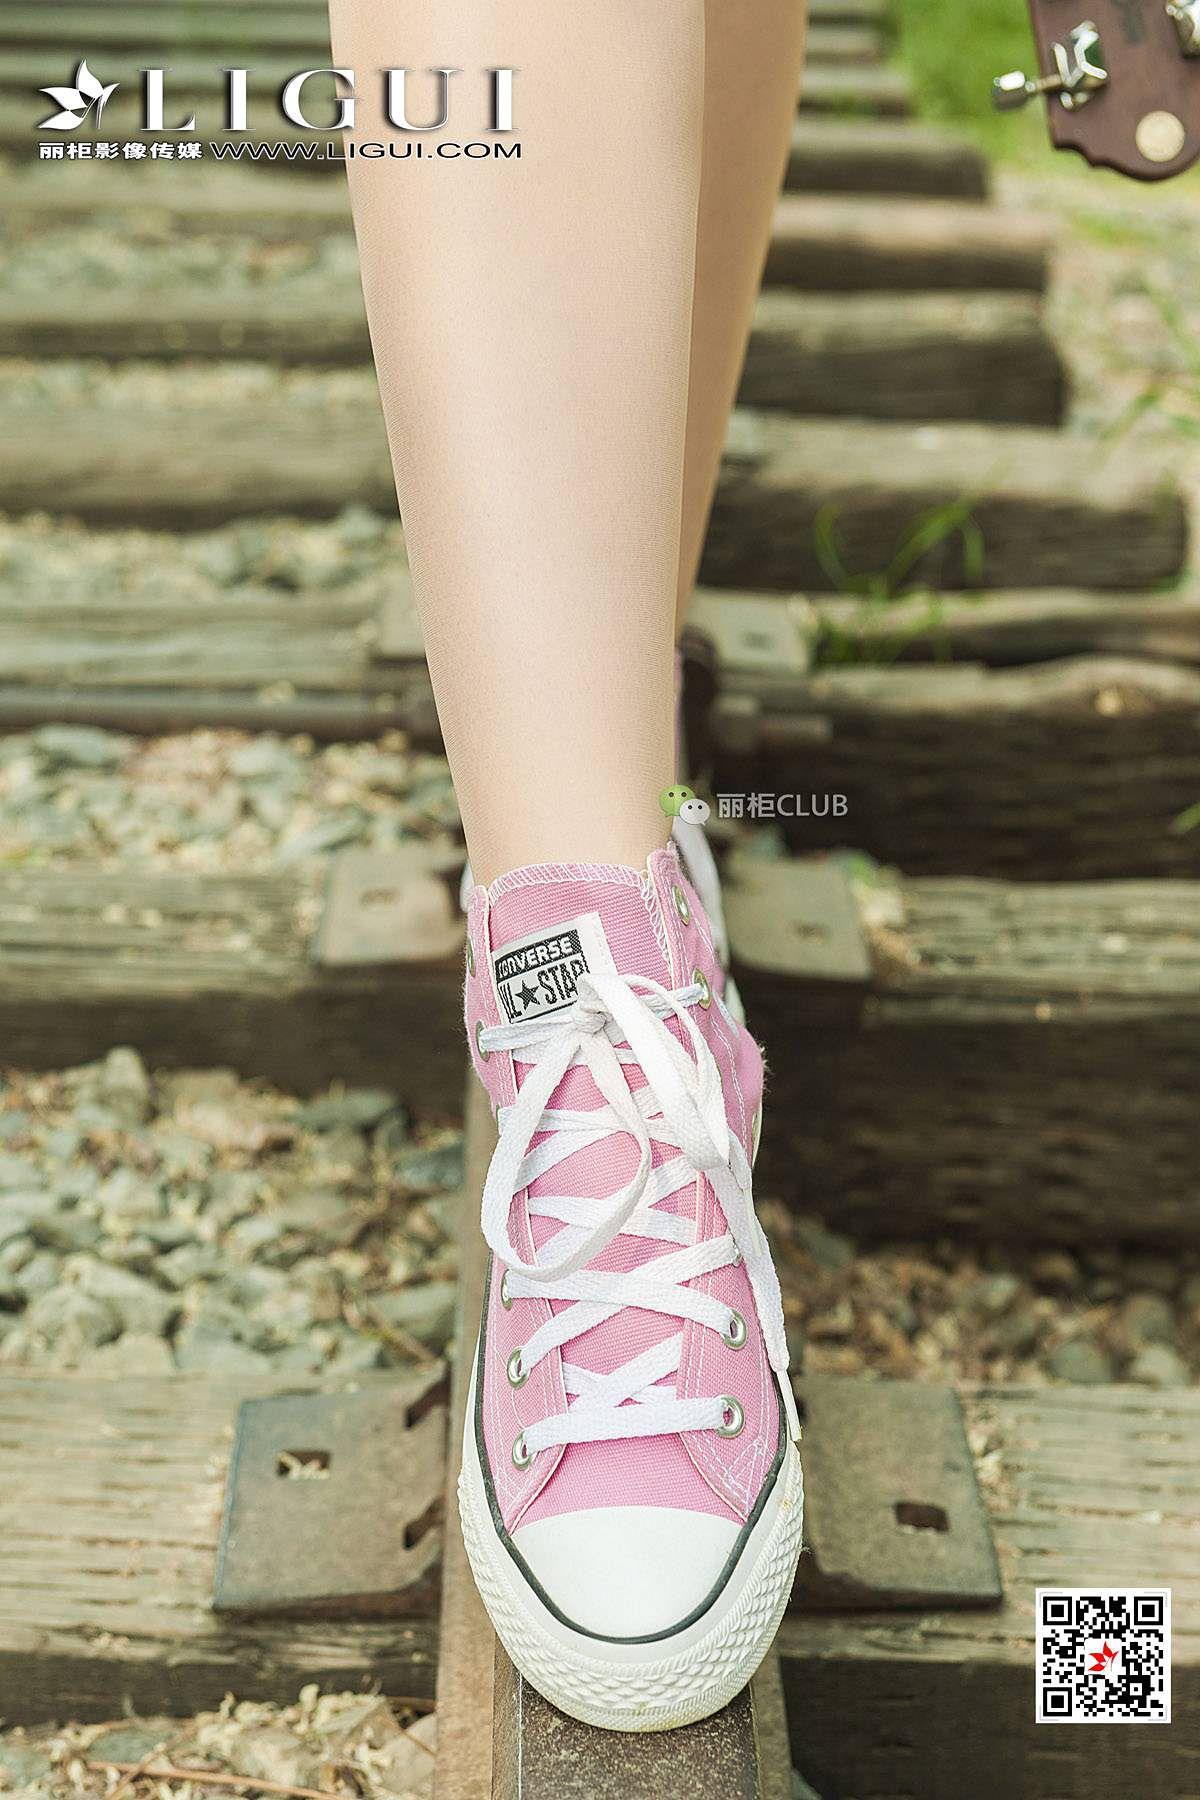 VOL.532 [丽柜]热裤丝袜美腿美足美脚长腿美女:丽柜小戈(腿模小戈,足模小戈,LIGUI小戈)超高清写真套图(61P)